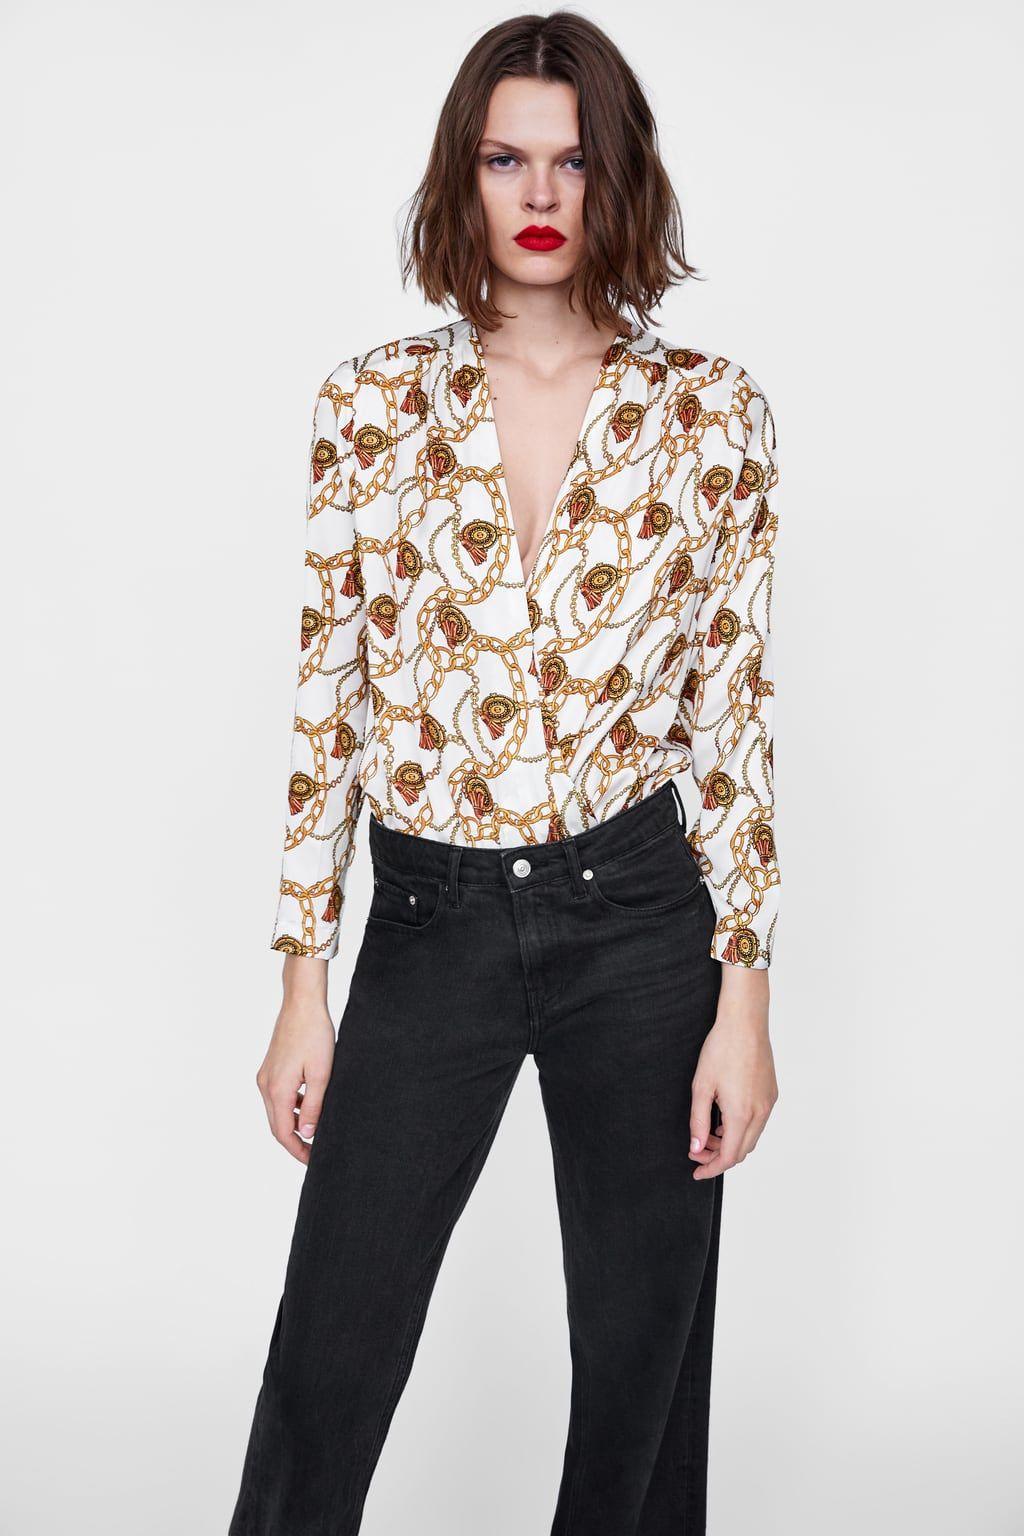 Women/'s Scarf Chain Print Ladies High Neck Ruffle Frill Blouse Shirt Top